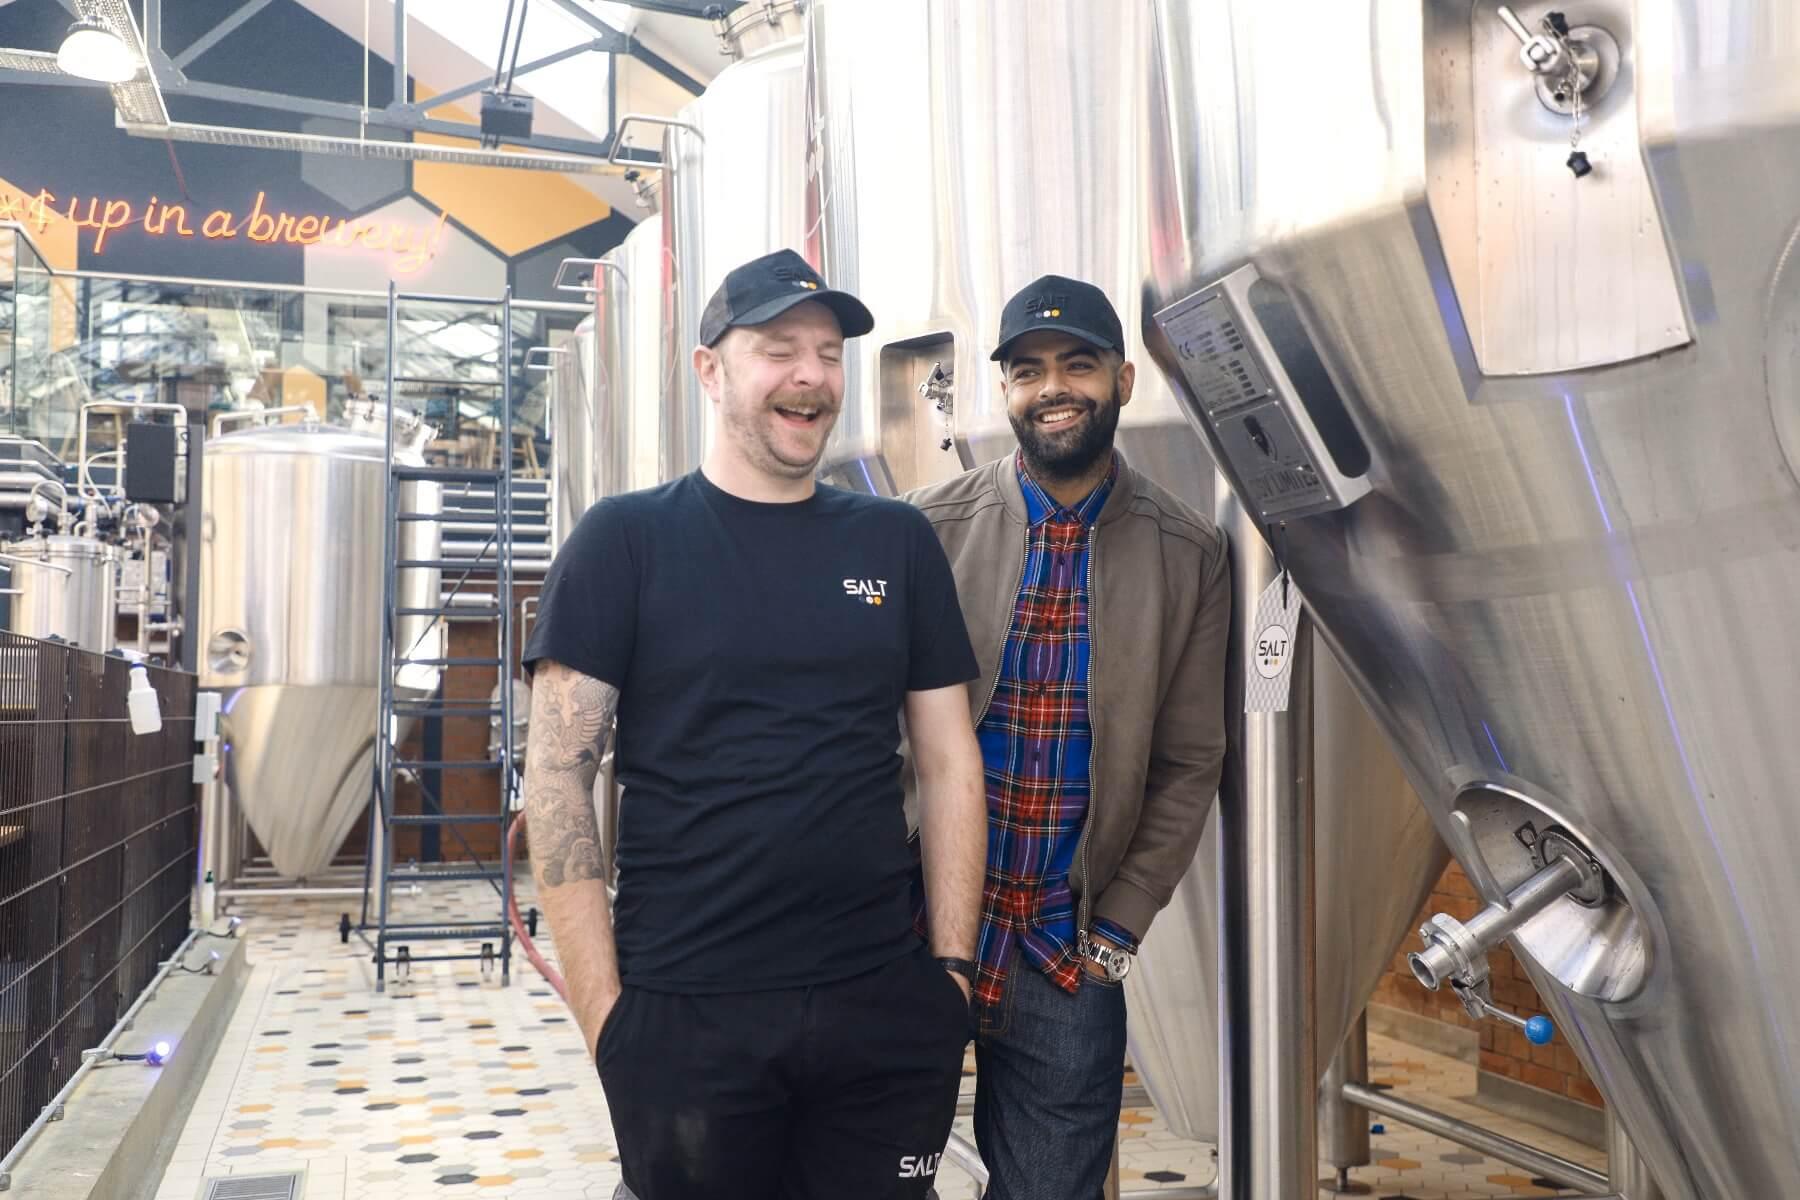 Salt brewery happy staff